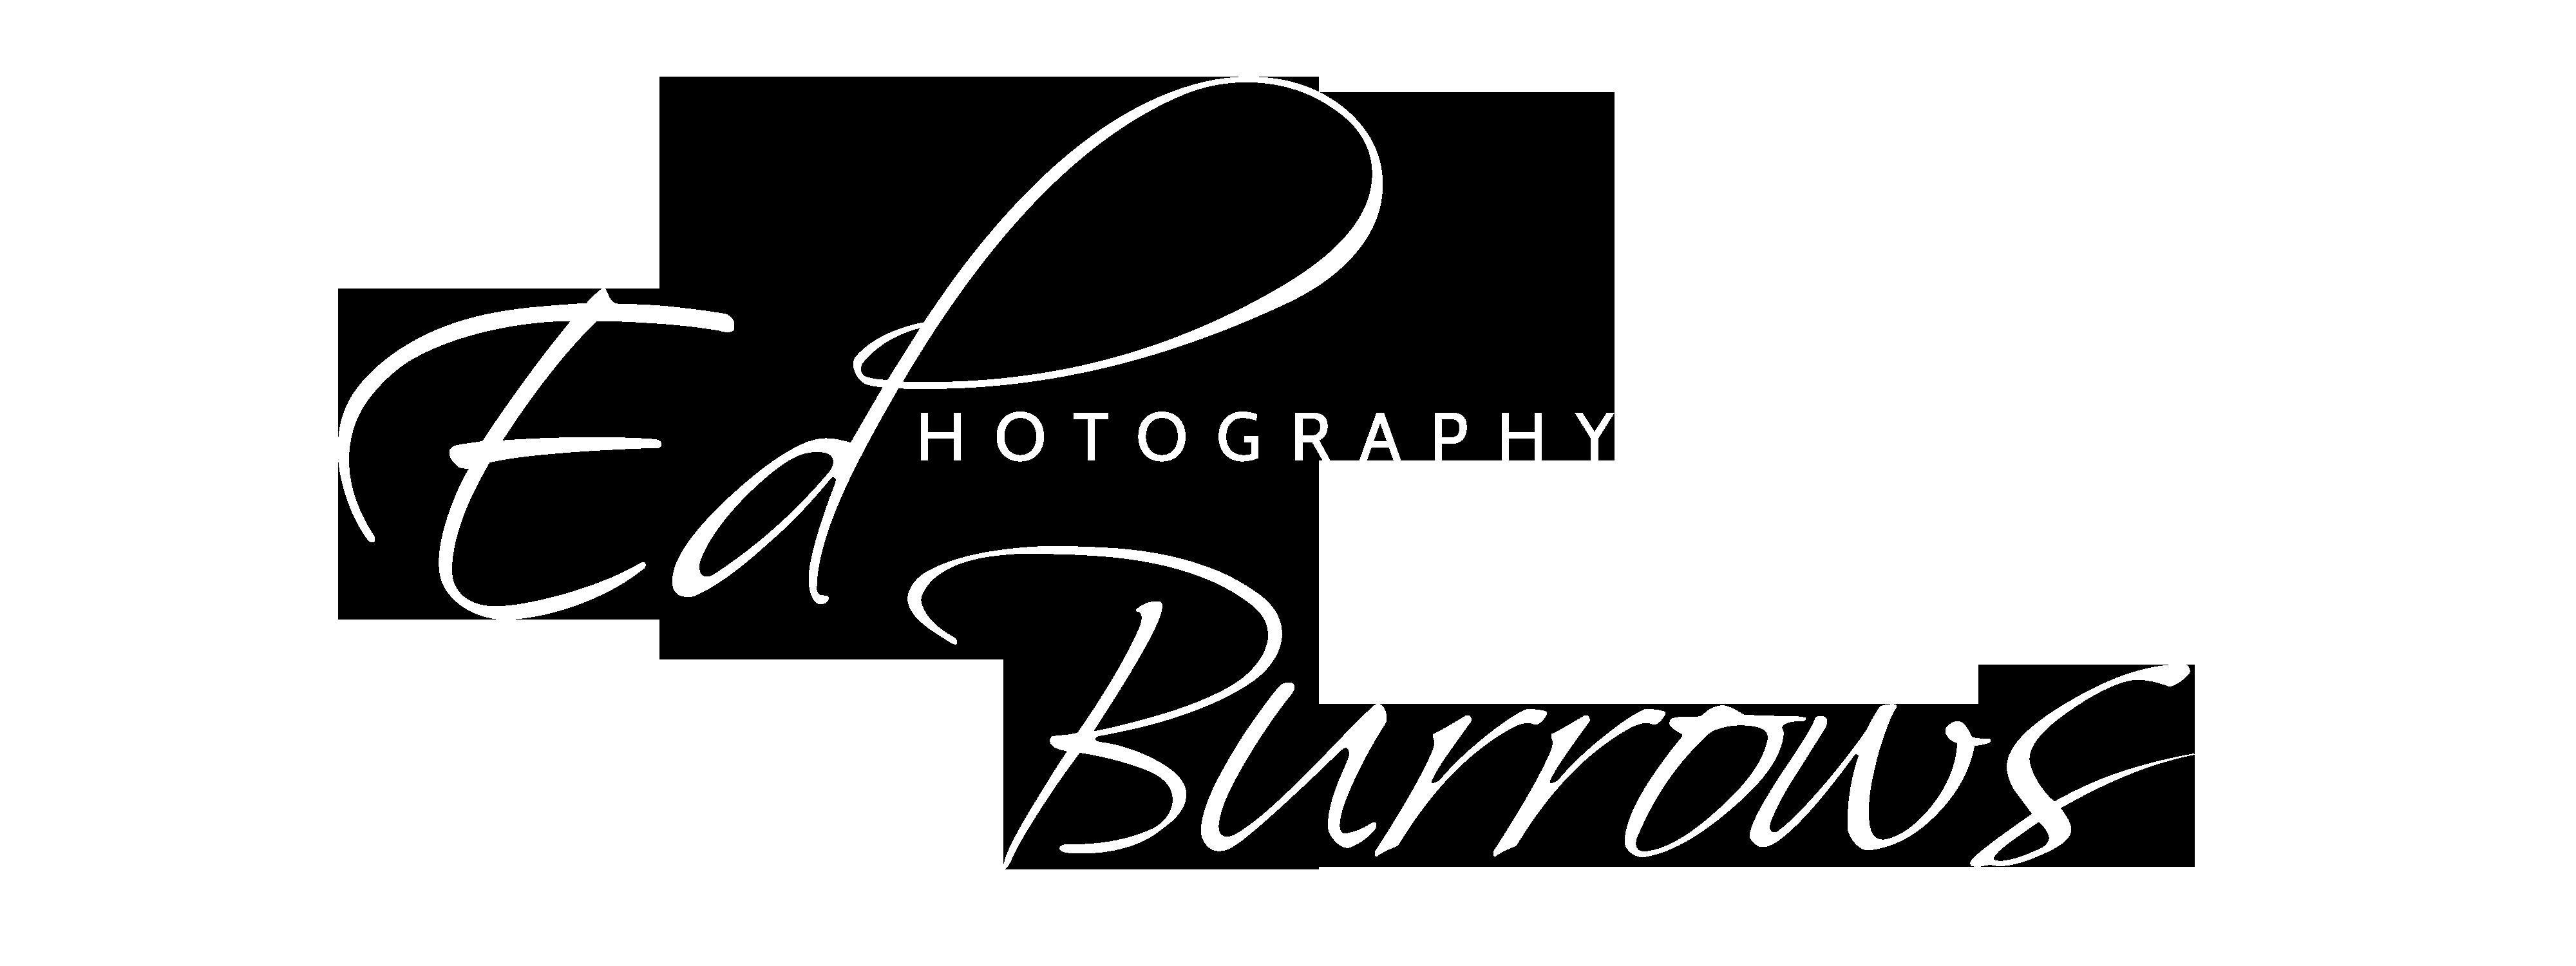 Edward Burrows